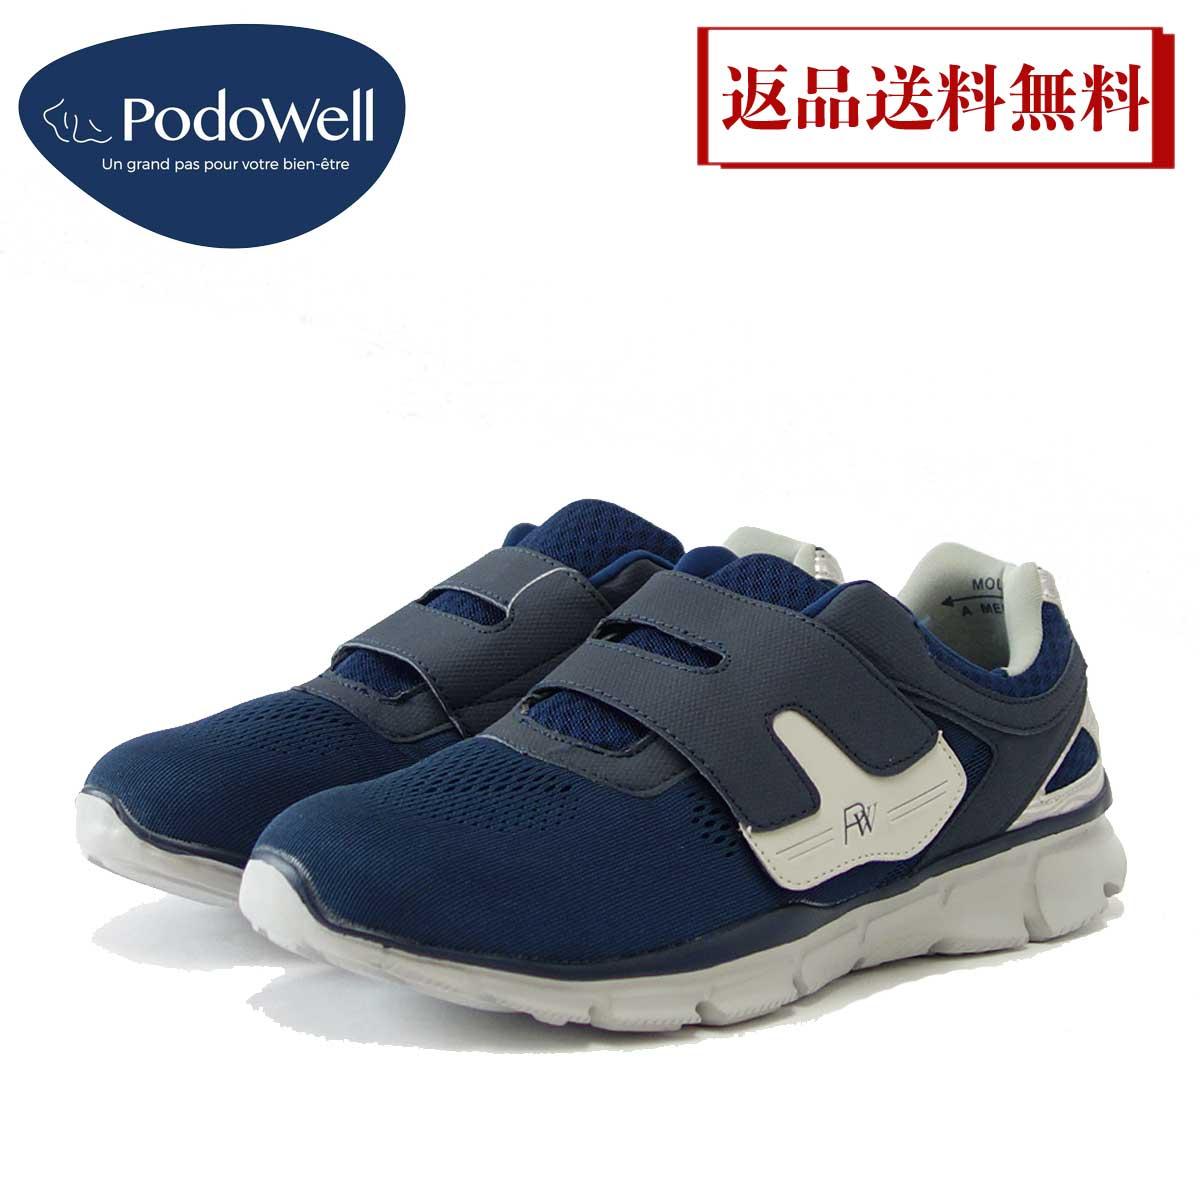 PodoWell ポドウエル VERCORS (ヴェルコール) ネイビー(メンズ) ゆったり幅広 リハビリ 介護シューズ 「靴」